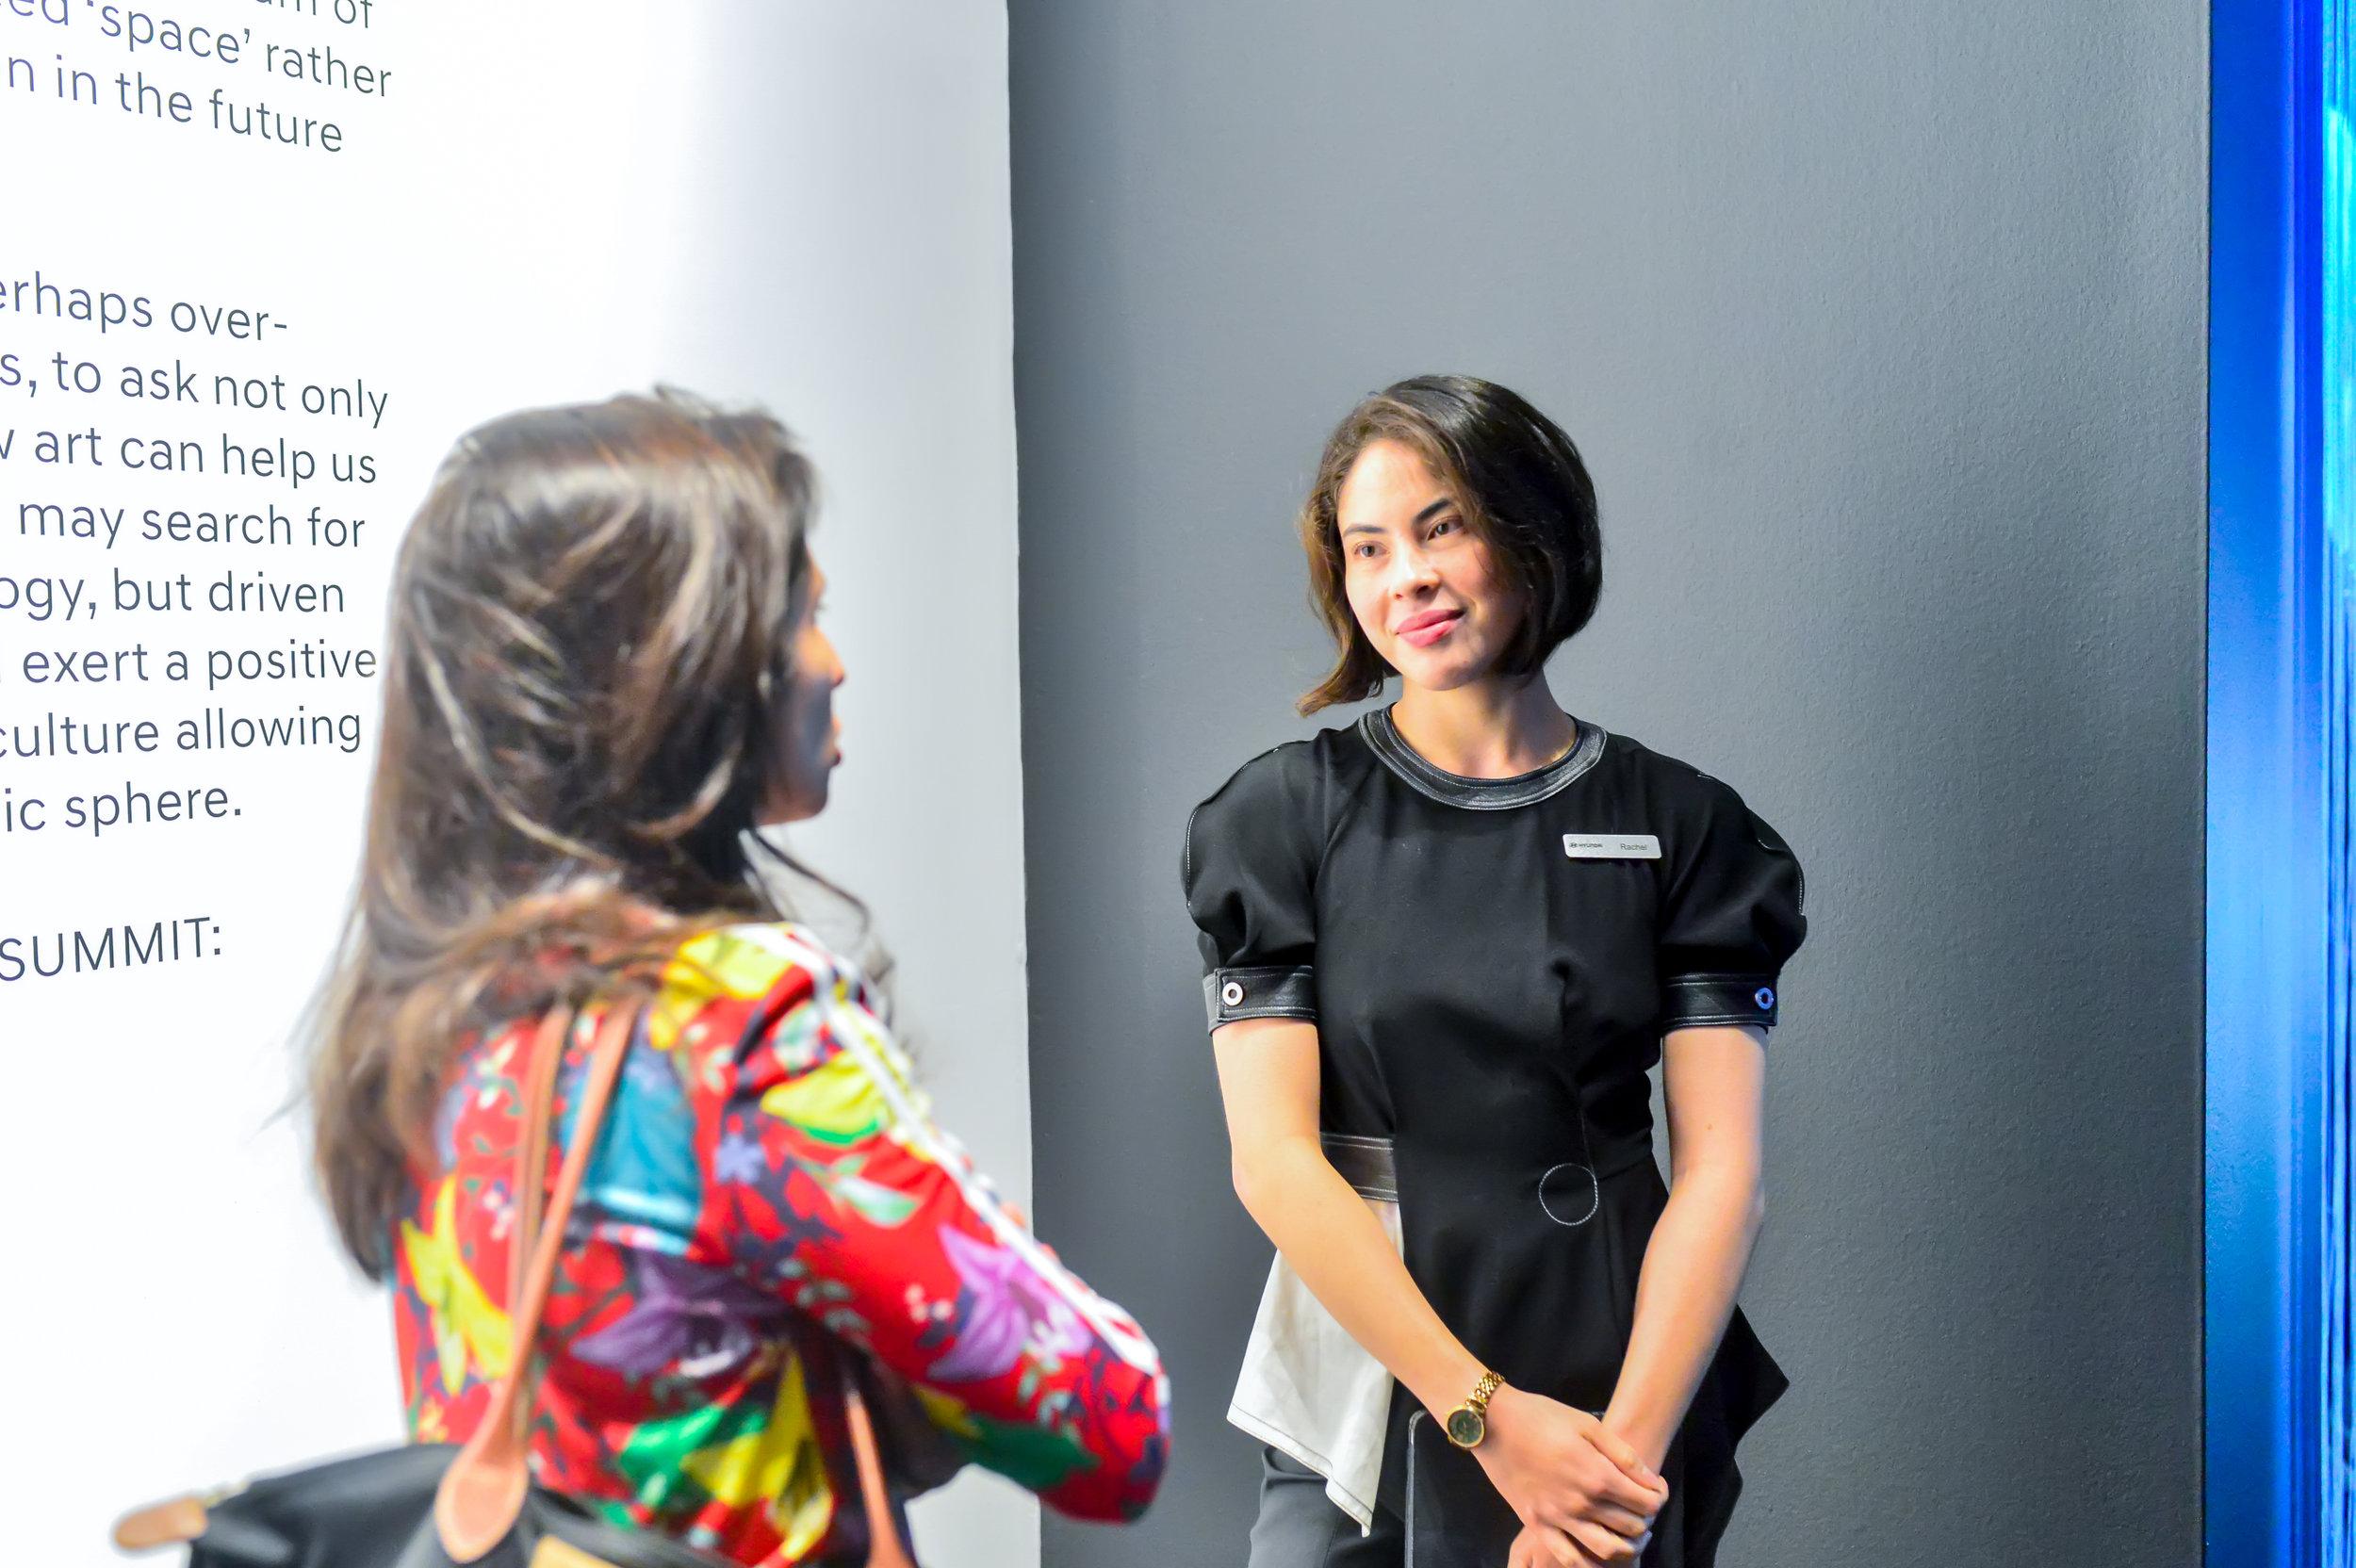 OHelloMedia-Hyundai-Christie'sAuctionHouse-6.28-TopSelect-7093.jpg